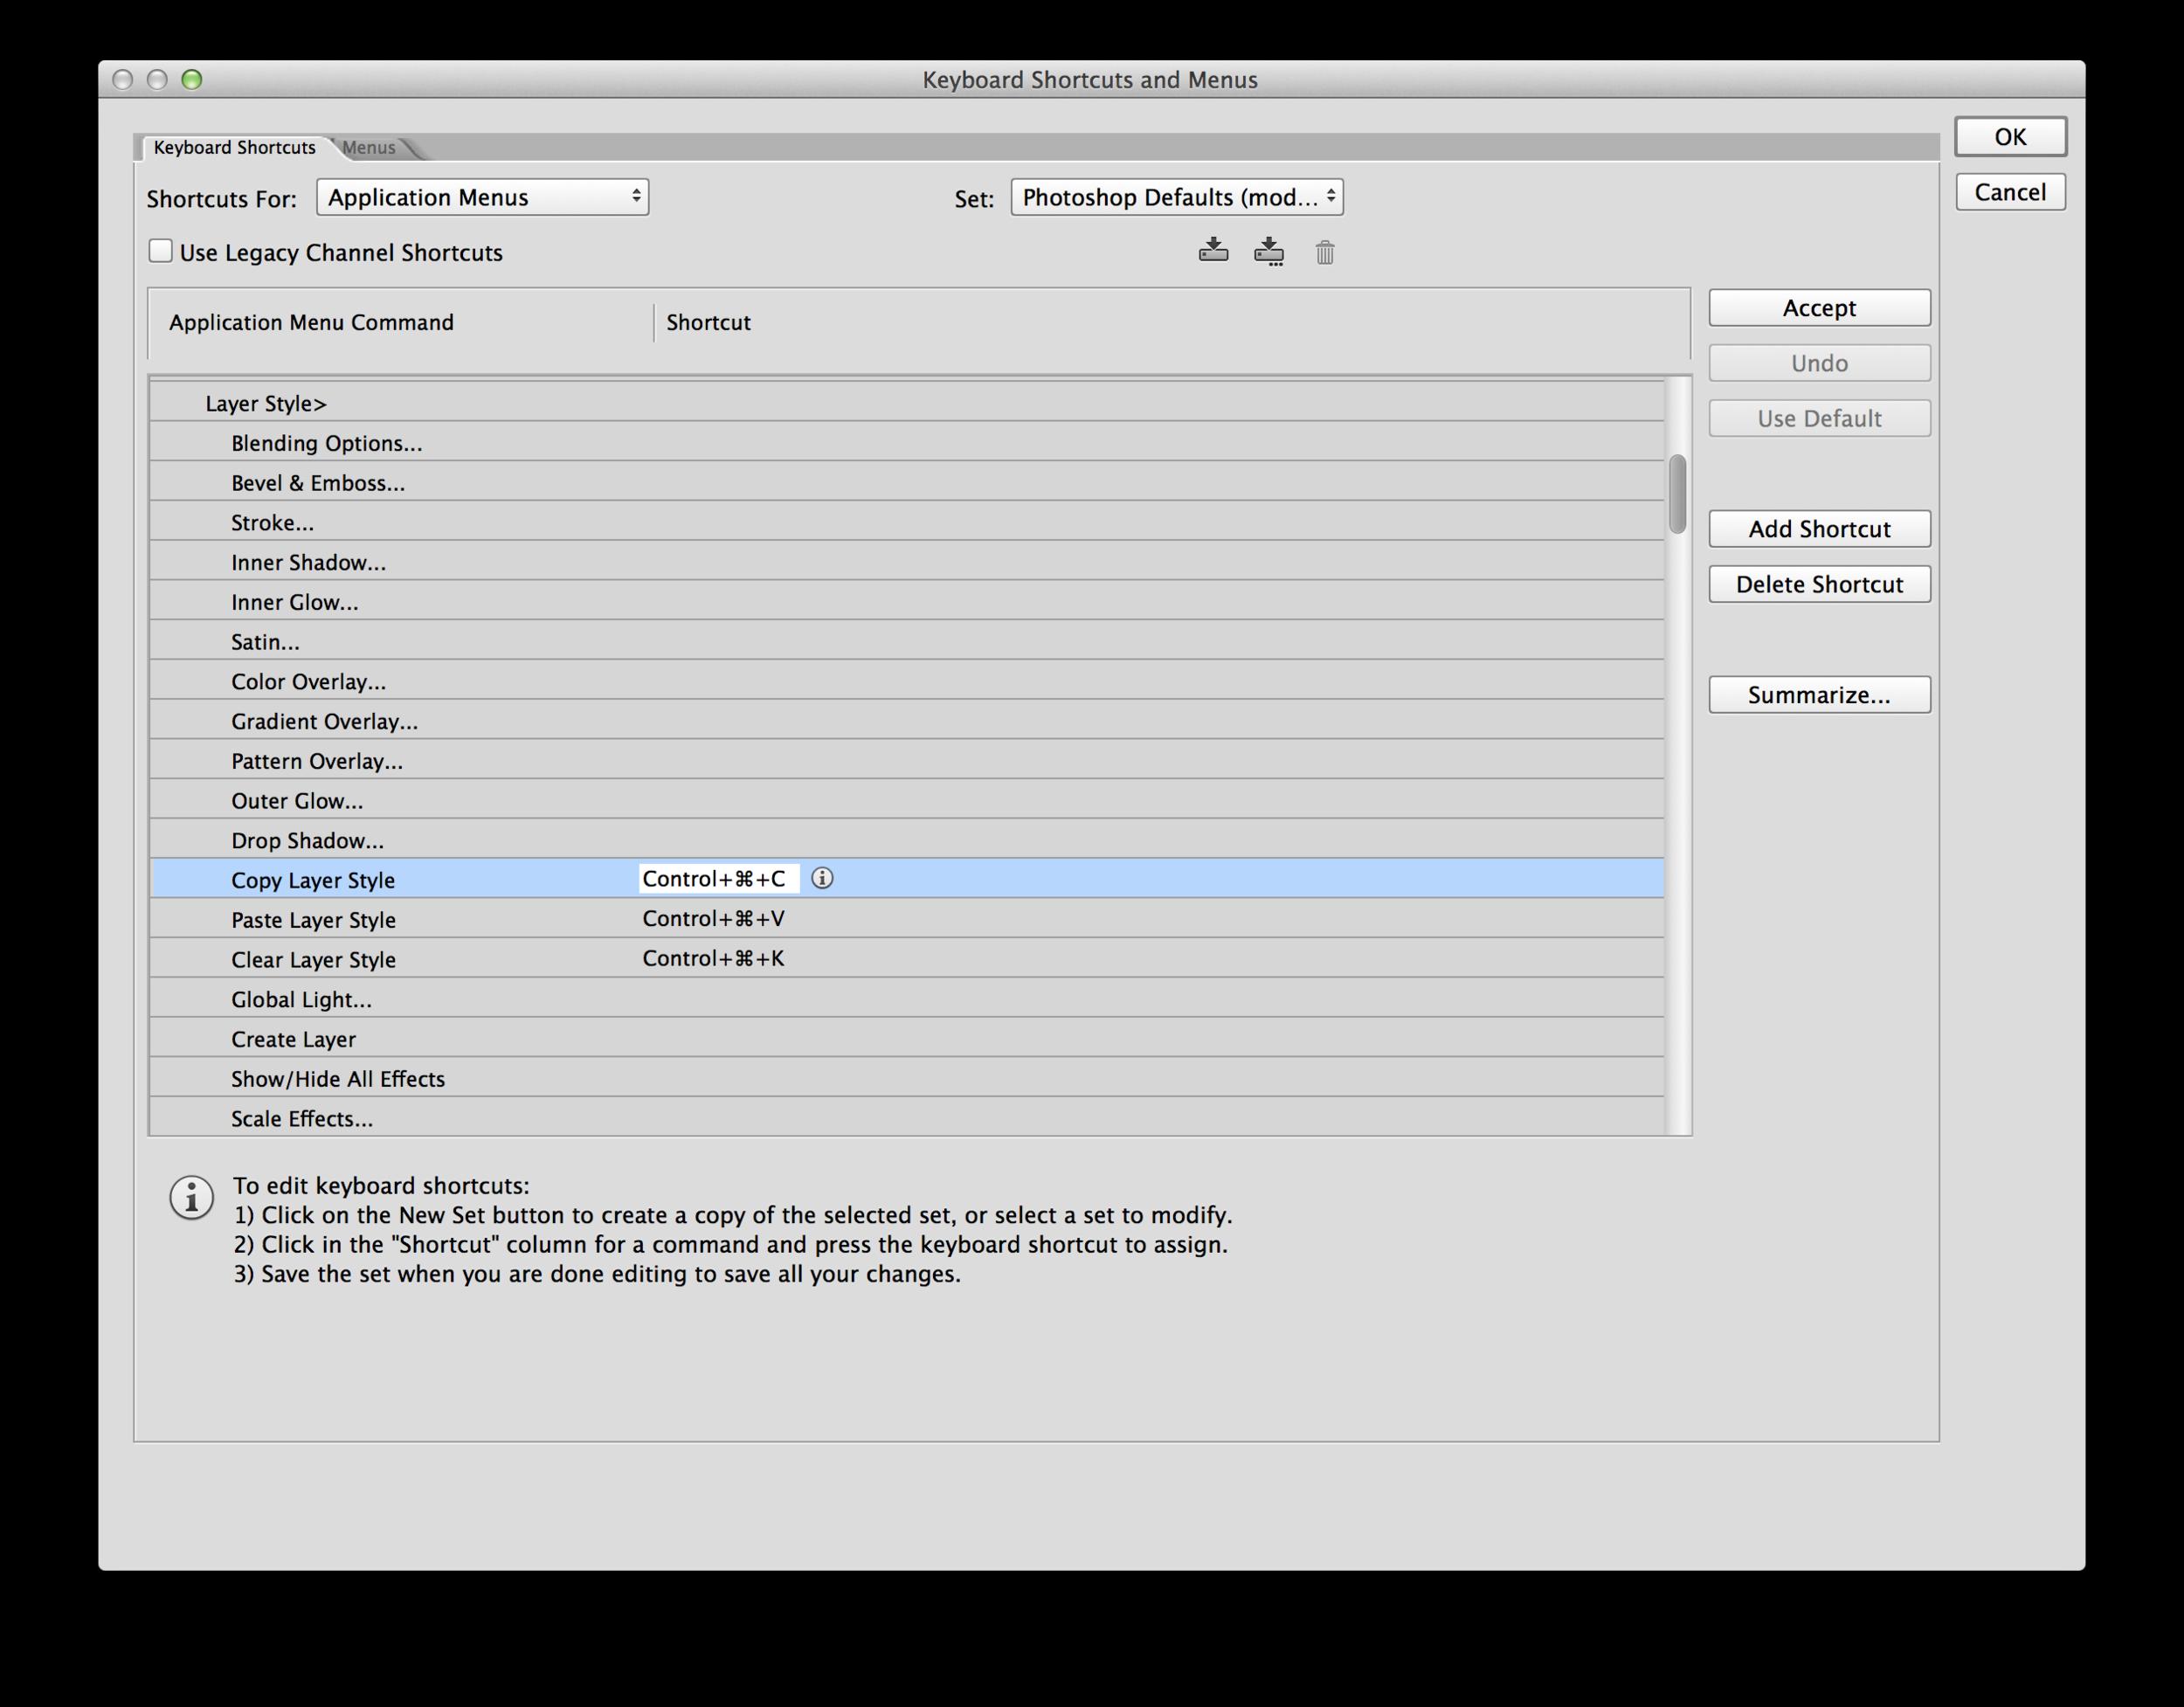 Change the shortcuts via Edit > Keyboard Shortcuts...